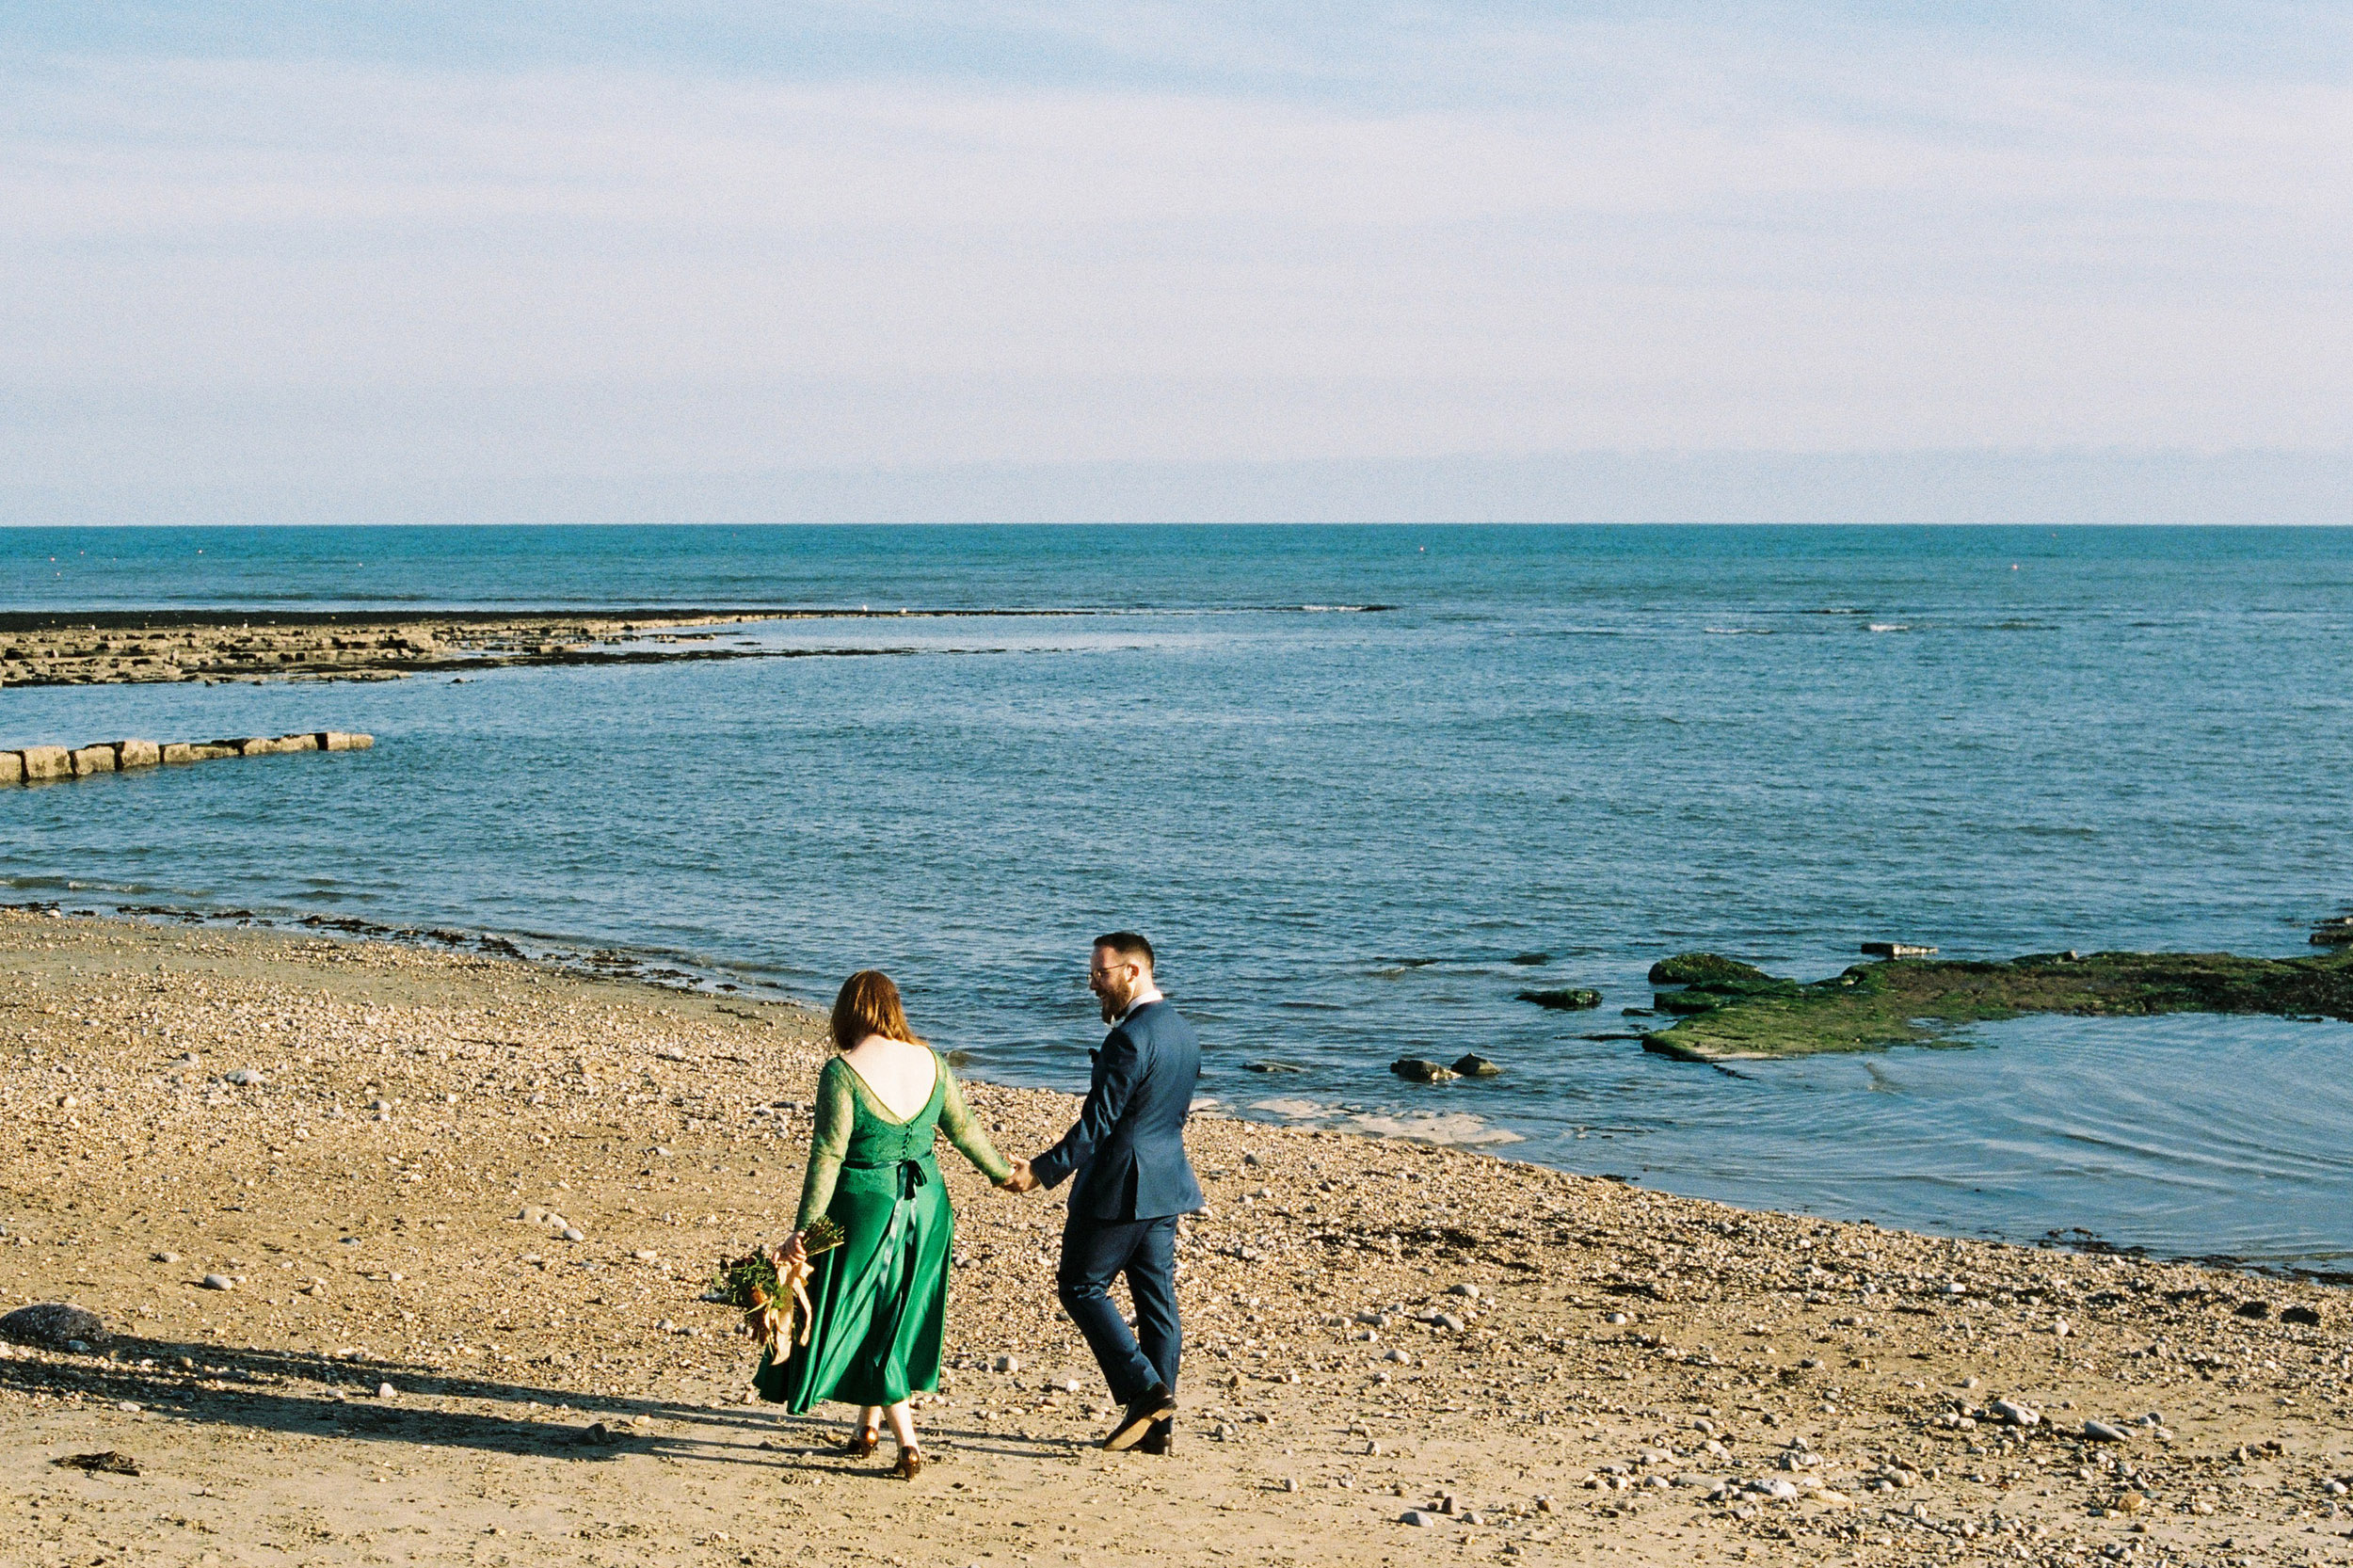 Lucy-Bespoke-Green-Silk-Lace-Wedding-Dress-Kate-Beaumont-Sheffield-19.jpg